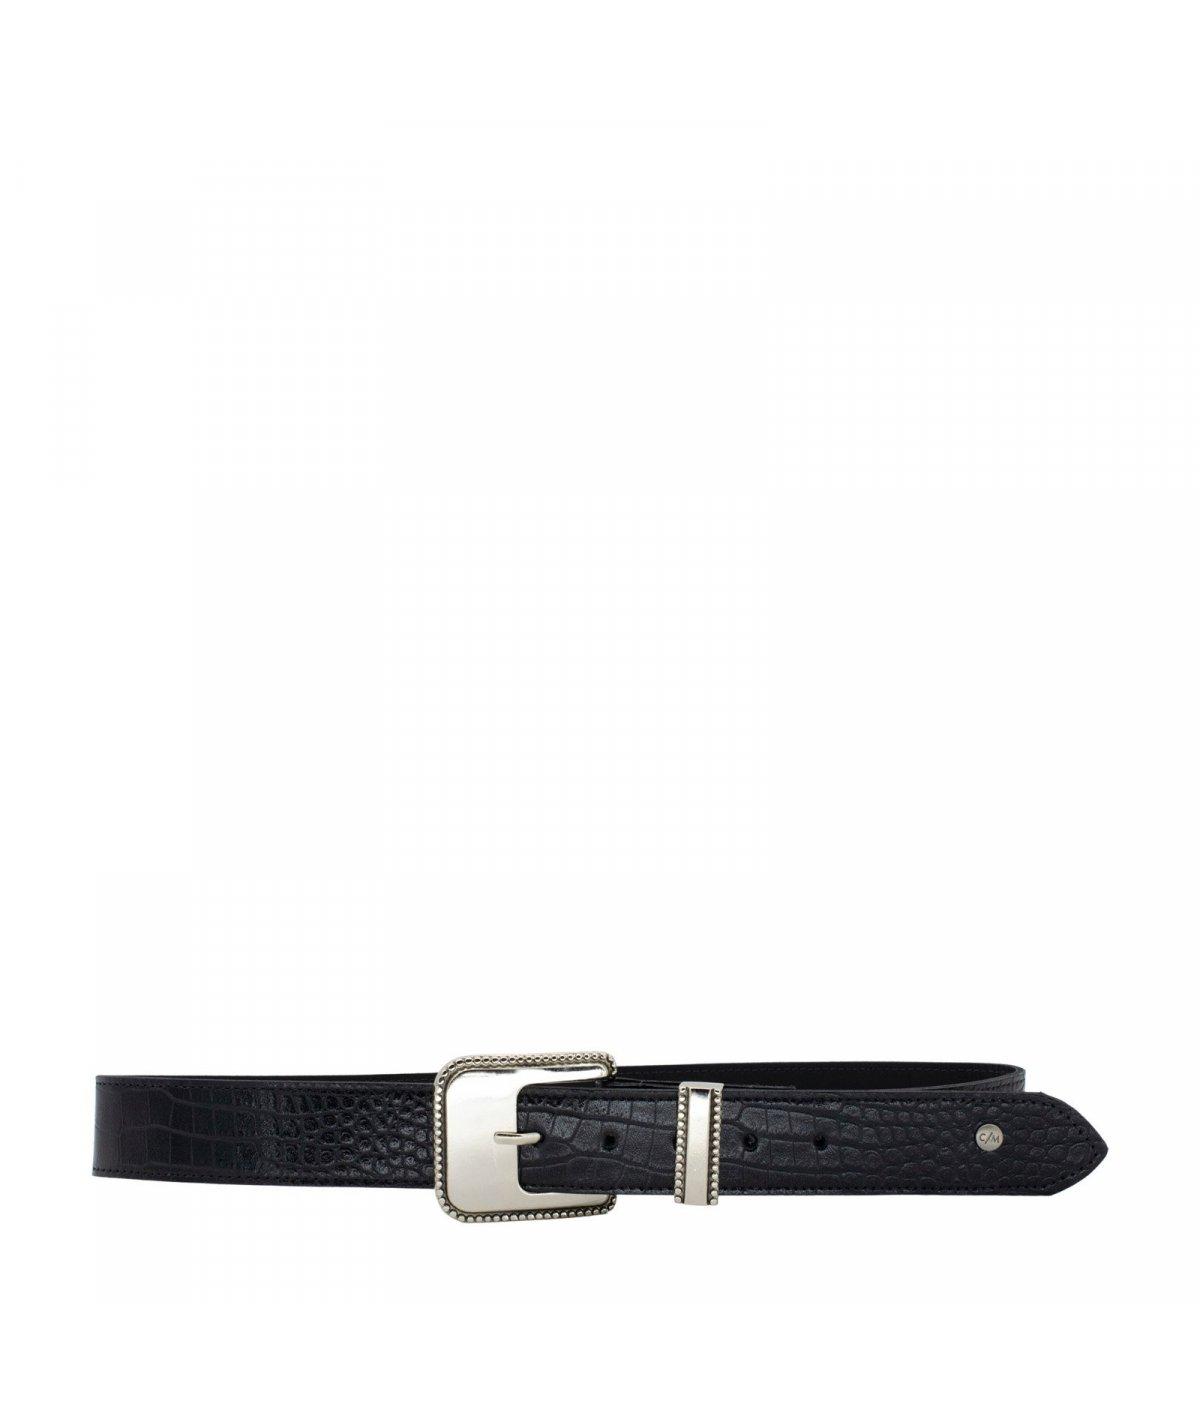 Cinturon Mujer 582 Richato